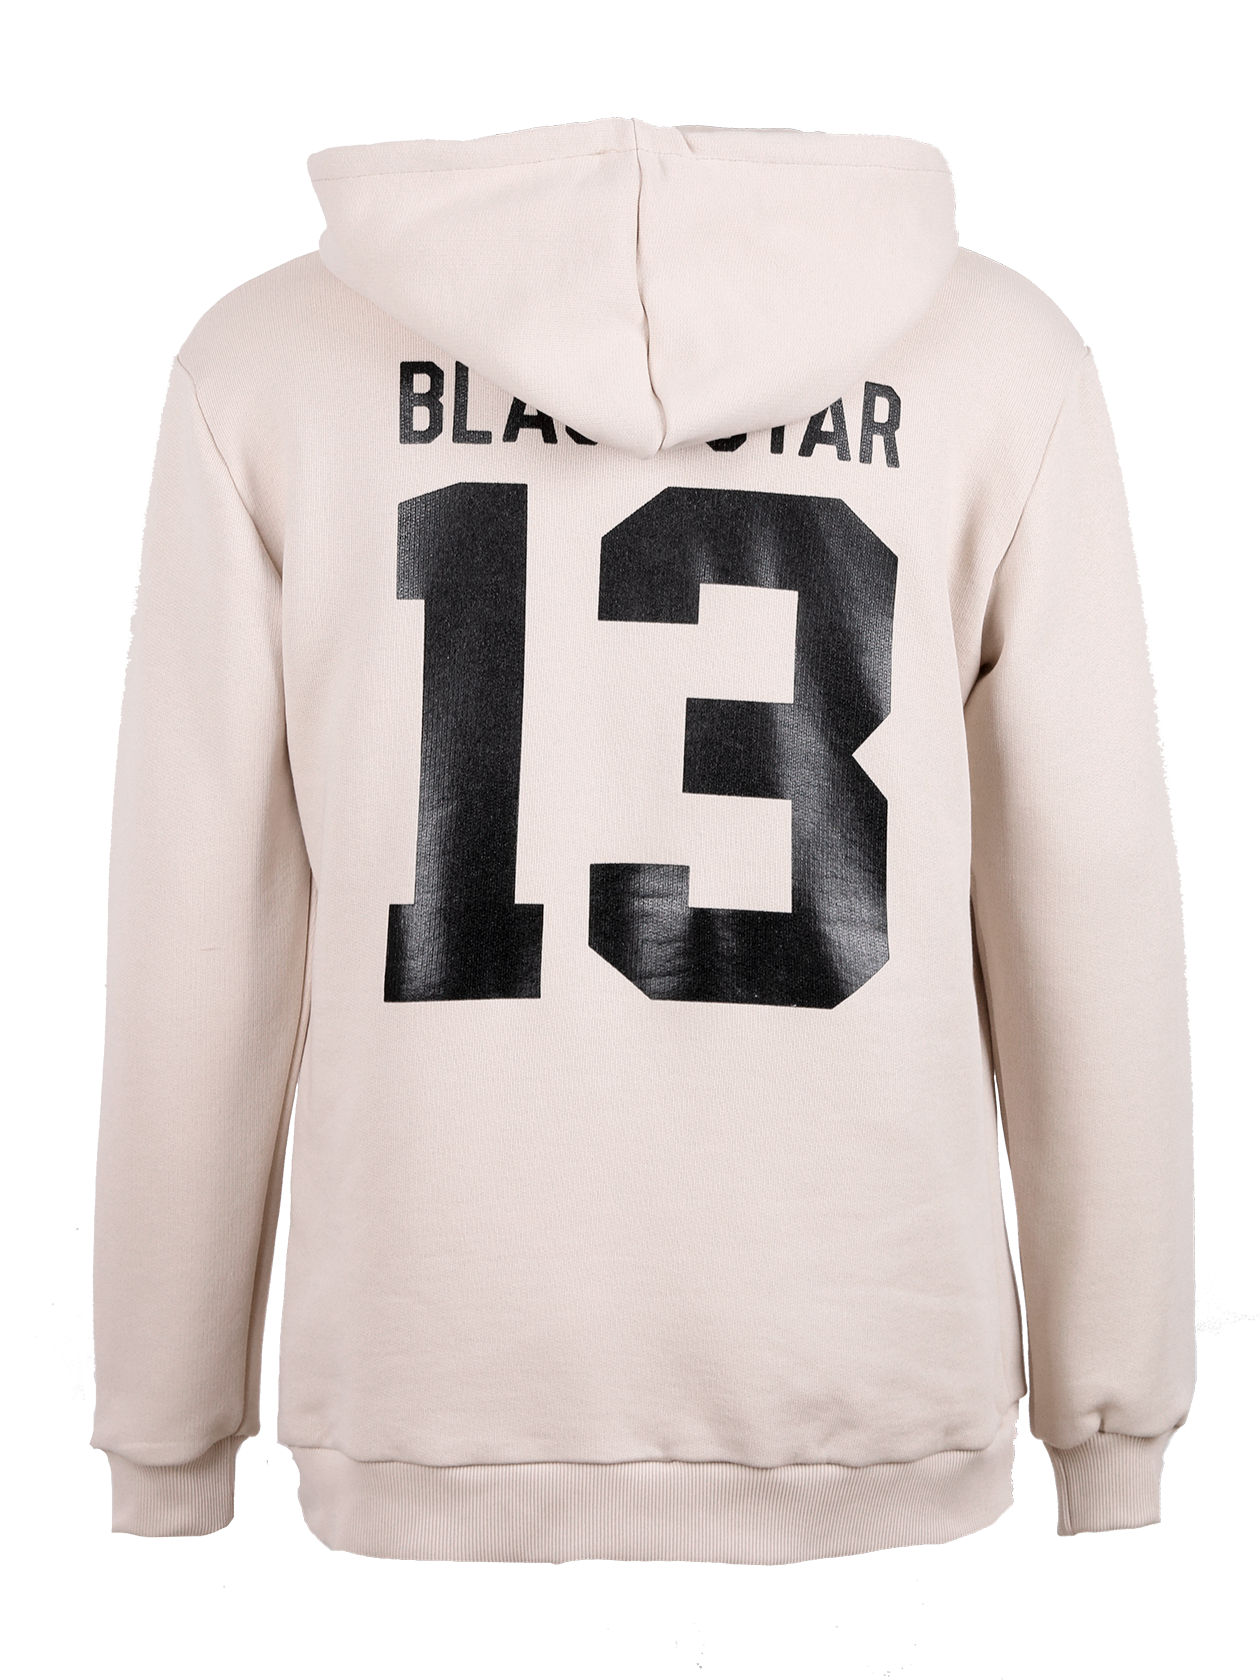 Костюм спортивный мужской BlackStar 13